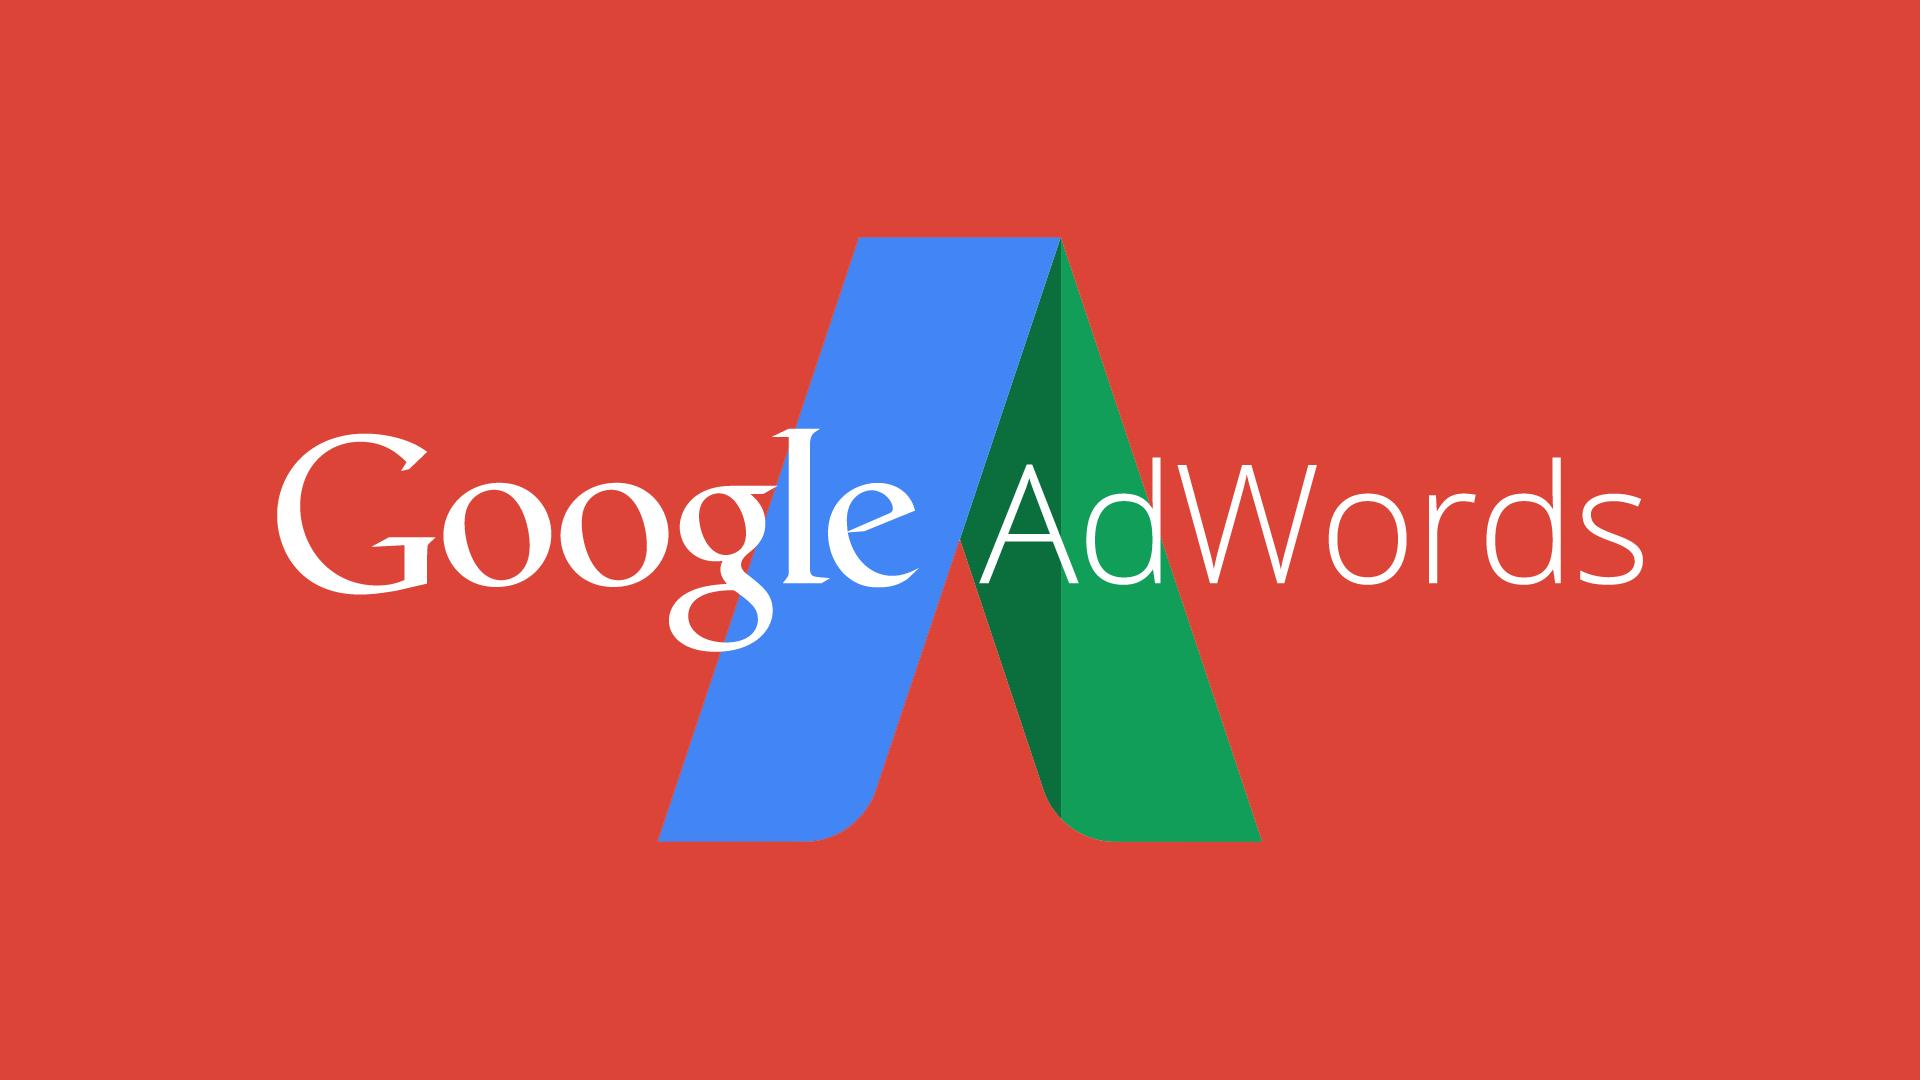 1497466517 googleadwordsconsultantnycpng N 1 750x365 - Google AdWords – Facebook Ads